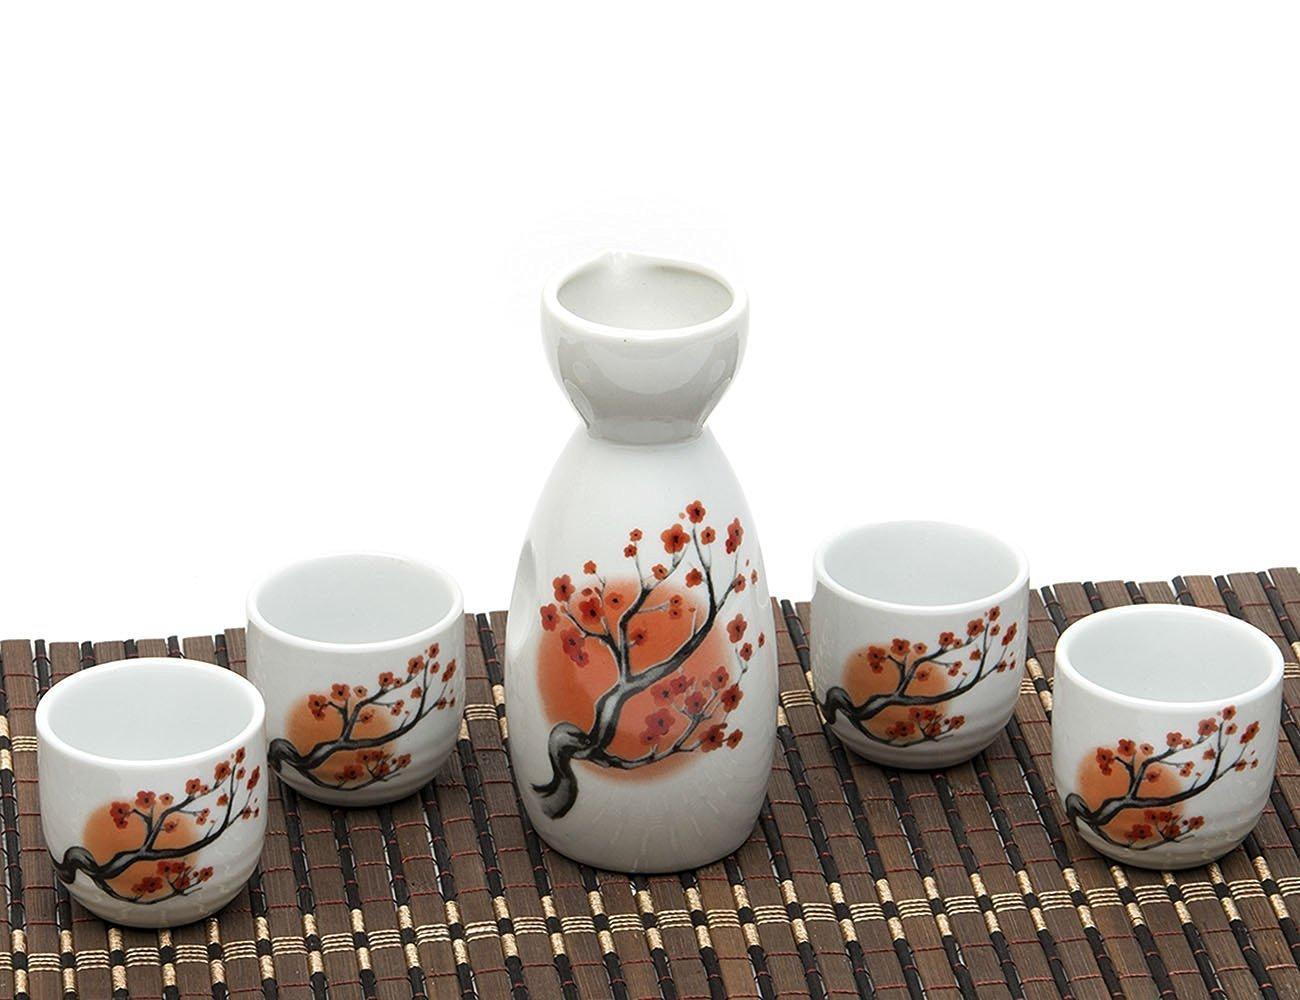 Japanese Sake Set, 5 Pieces Sake Set Hand Painted Retro House Design Porcelain Pottery Traditional Ceramic Cup Craft Wine Glasses(Blue) SYNCHKG095125